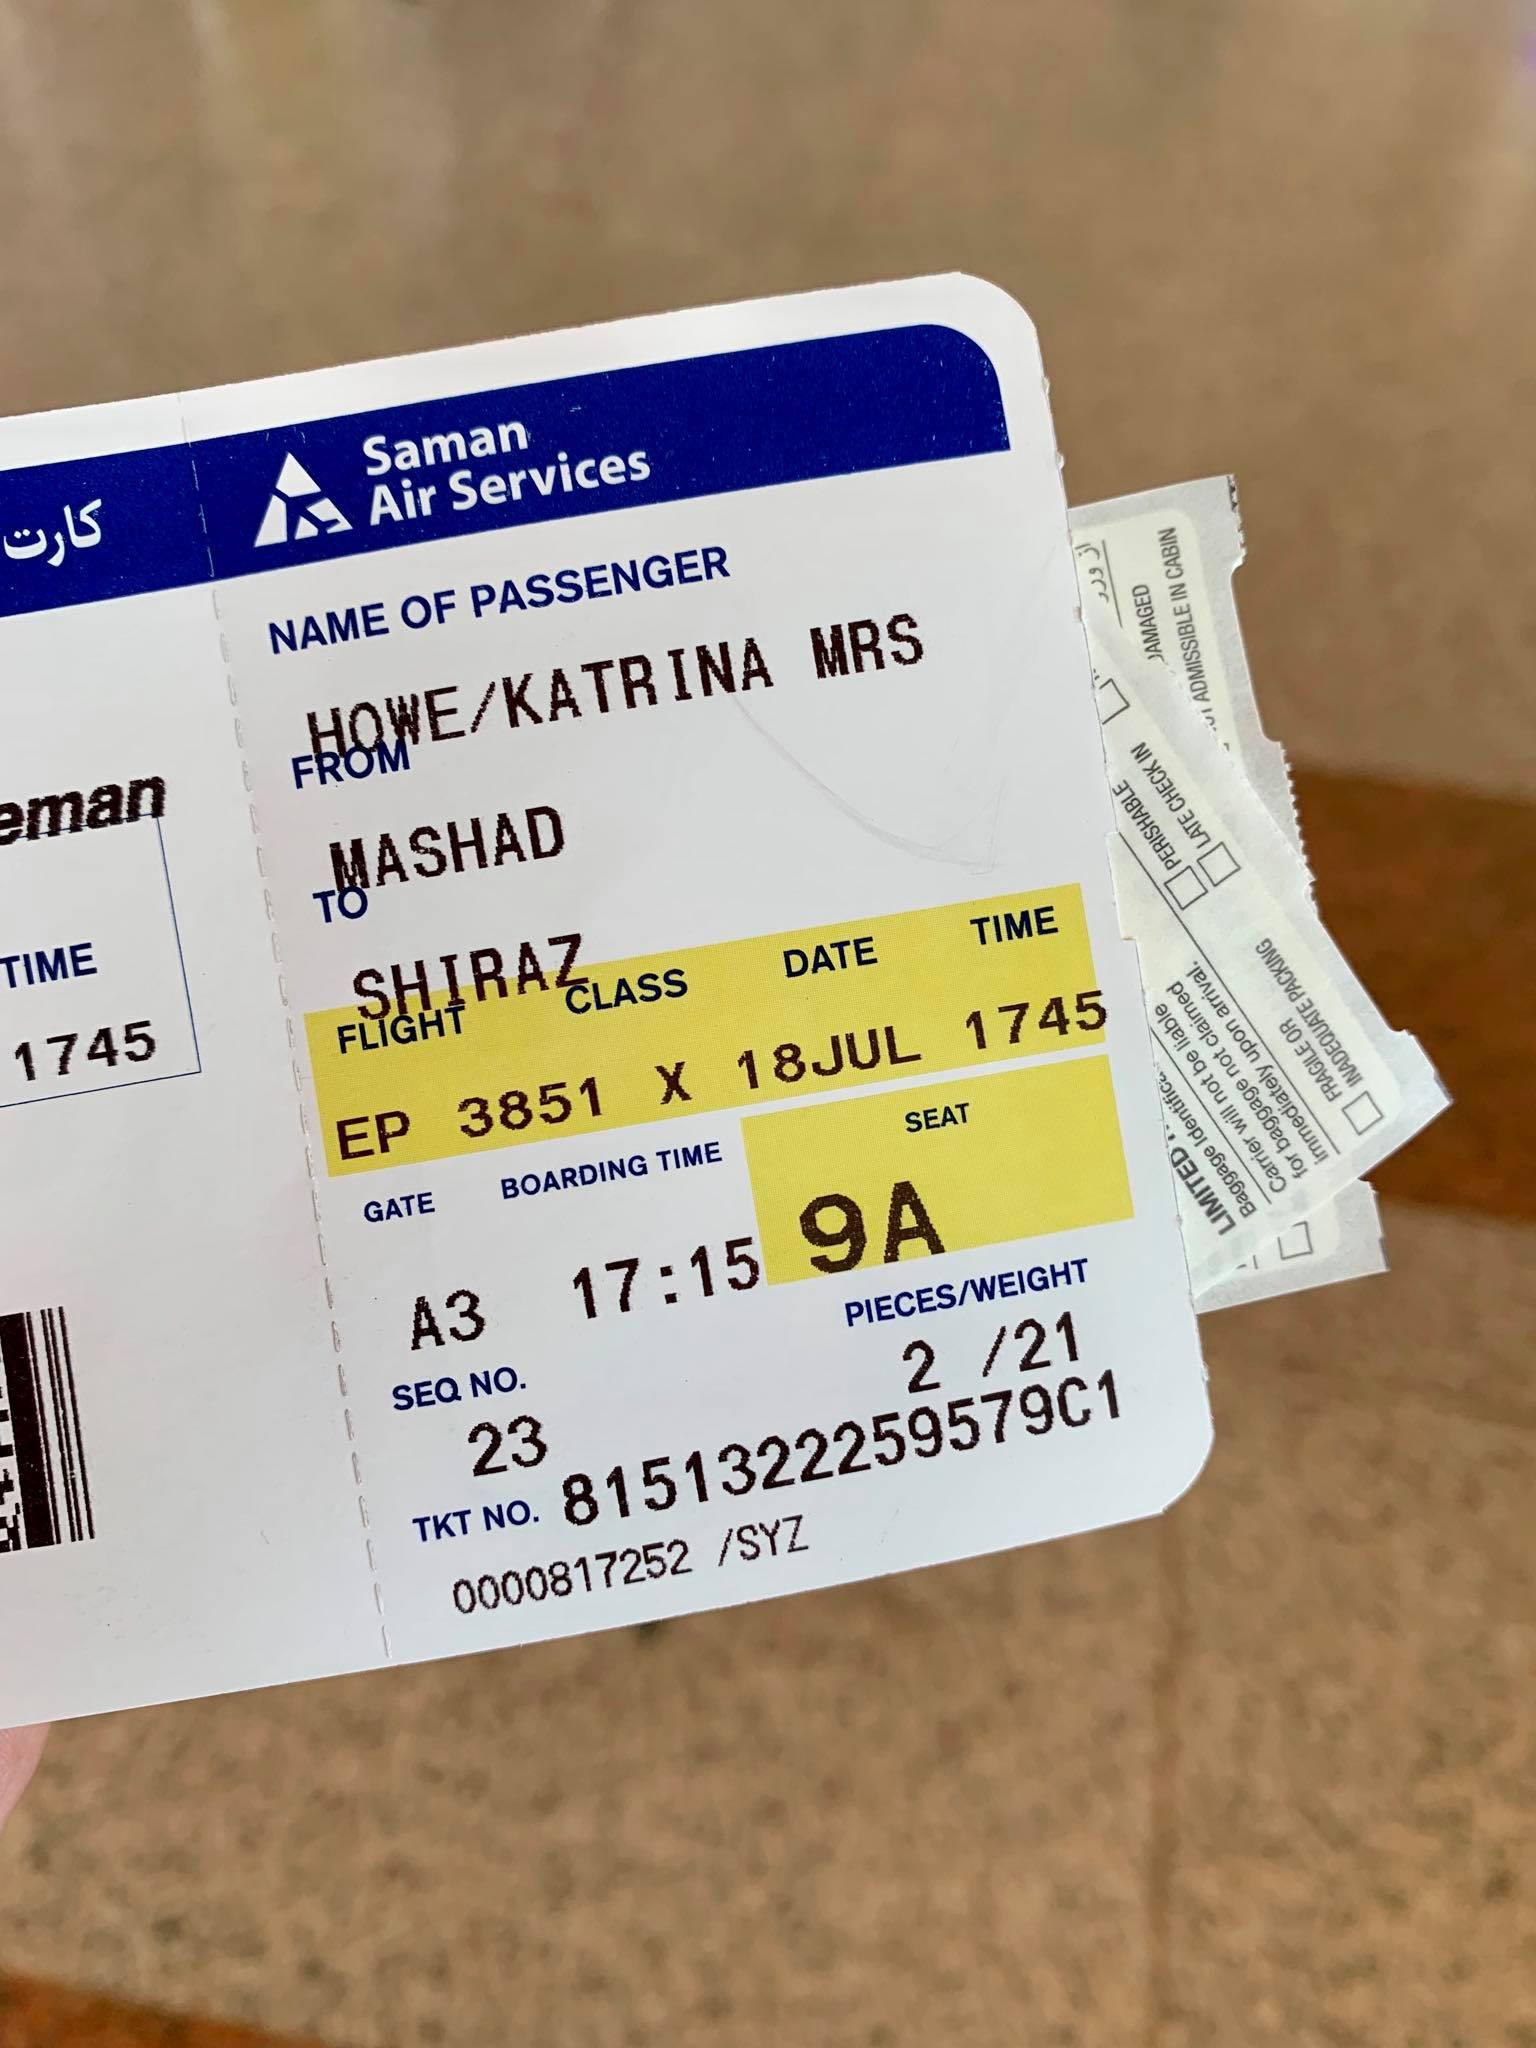 Kach Solo Travels in 2019 Mashhad to Shiraz5.jpg